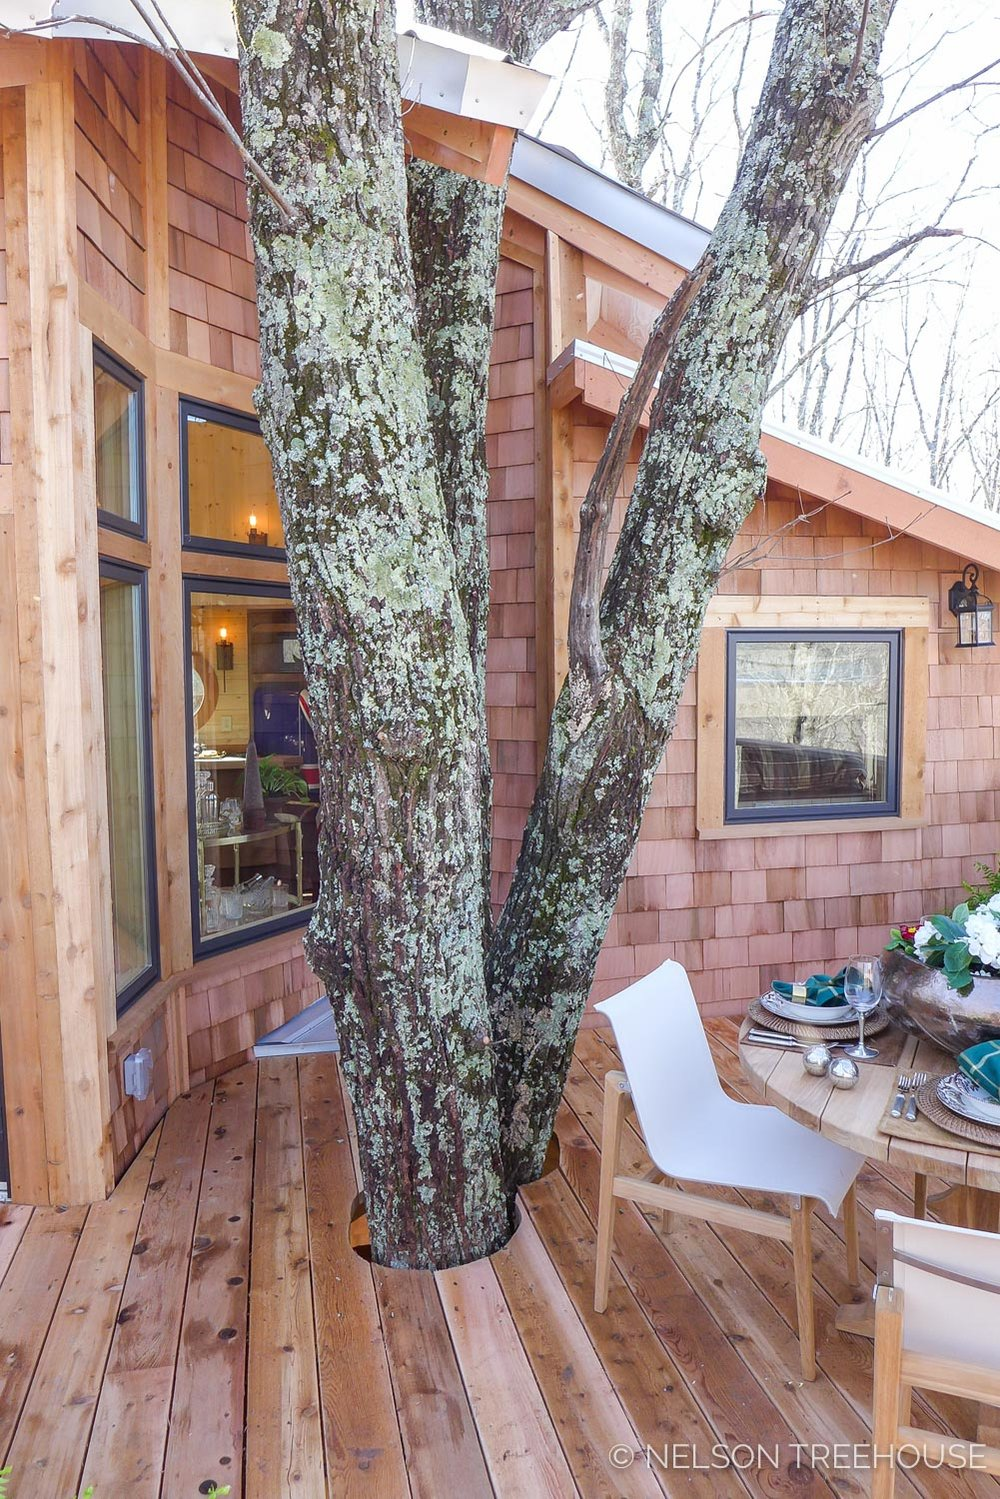 Super Spy Treehouse - Nelson Treehouse 2018 - Trees through deck